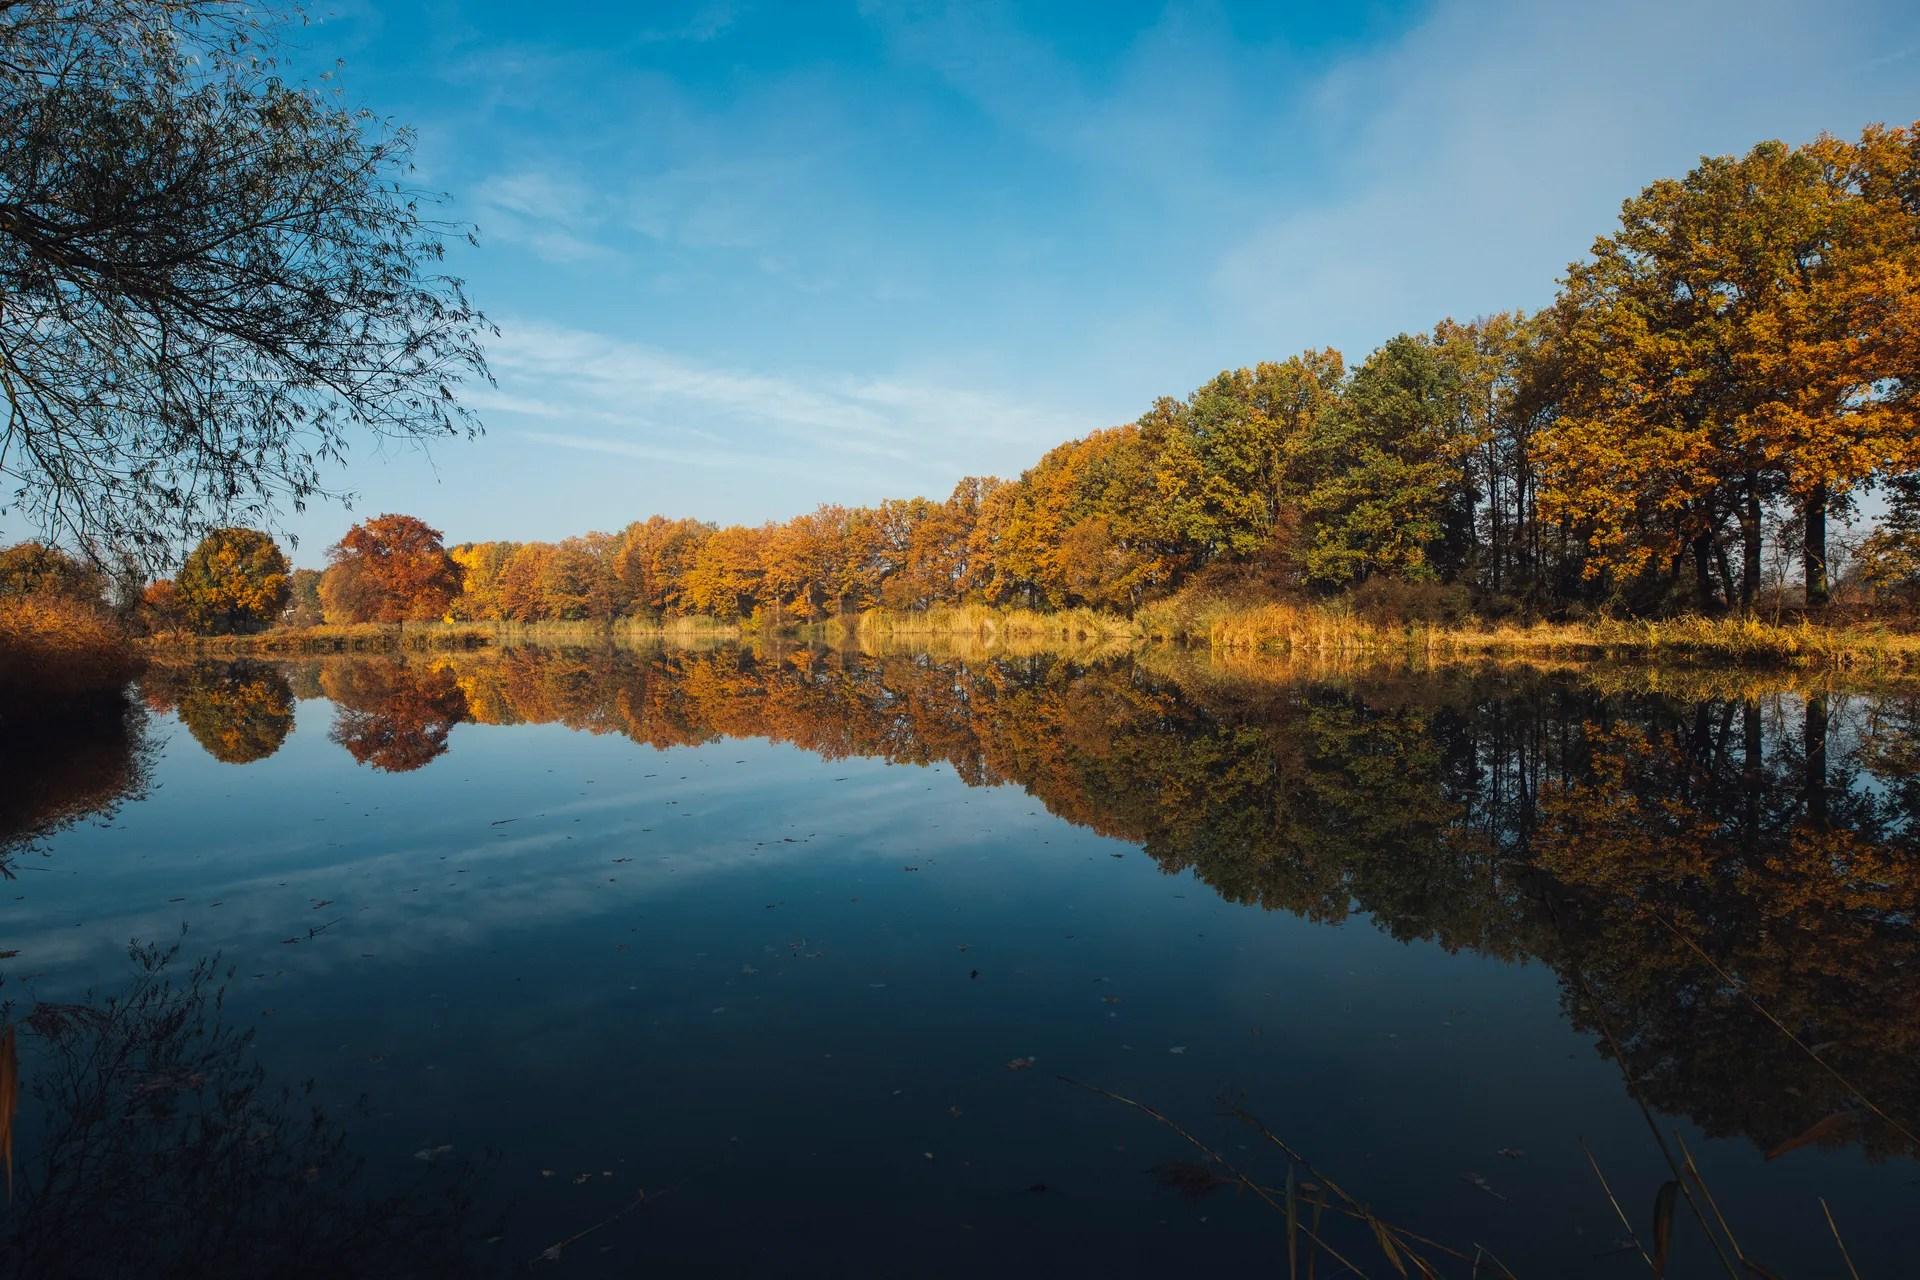 Walt Disney Wallpaper Quotes Cameraman In Focus Hollywood Studios Disney World